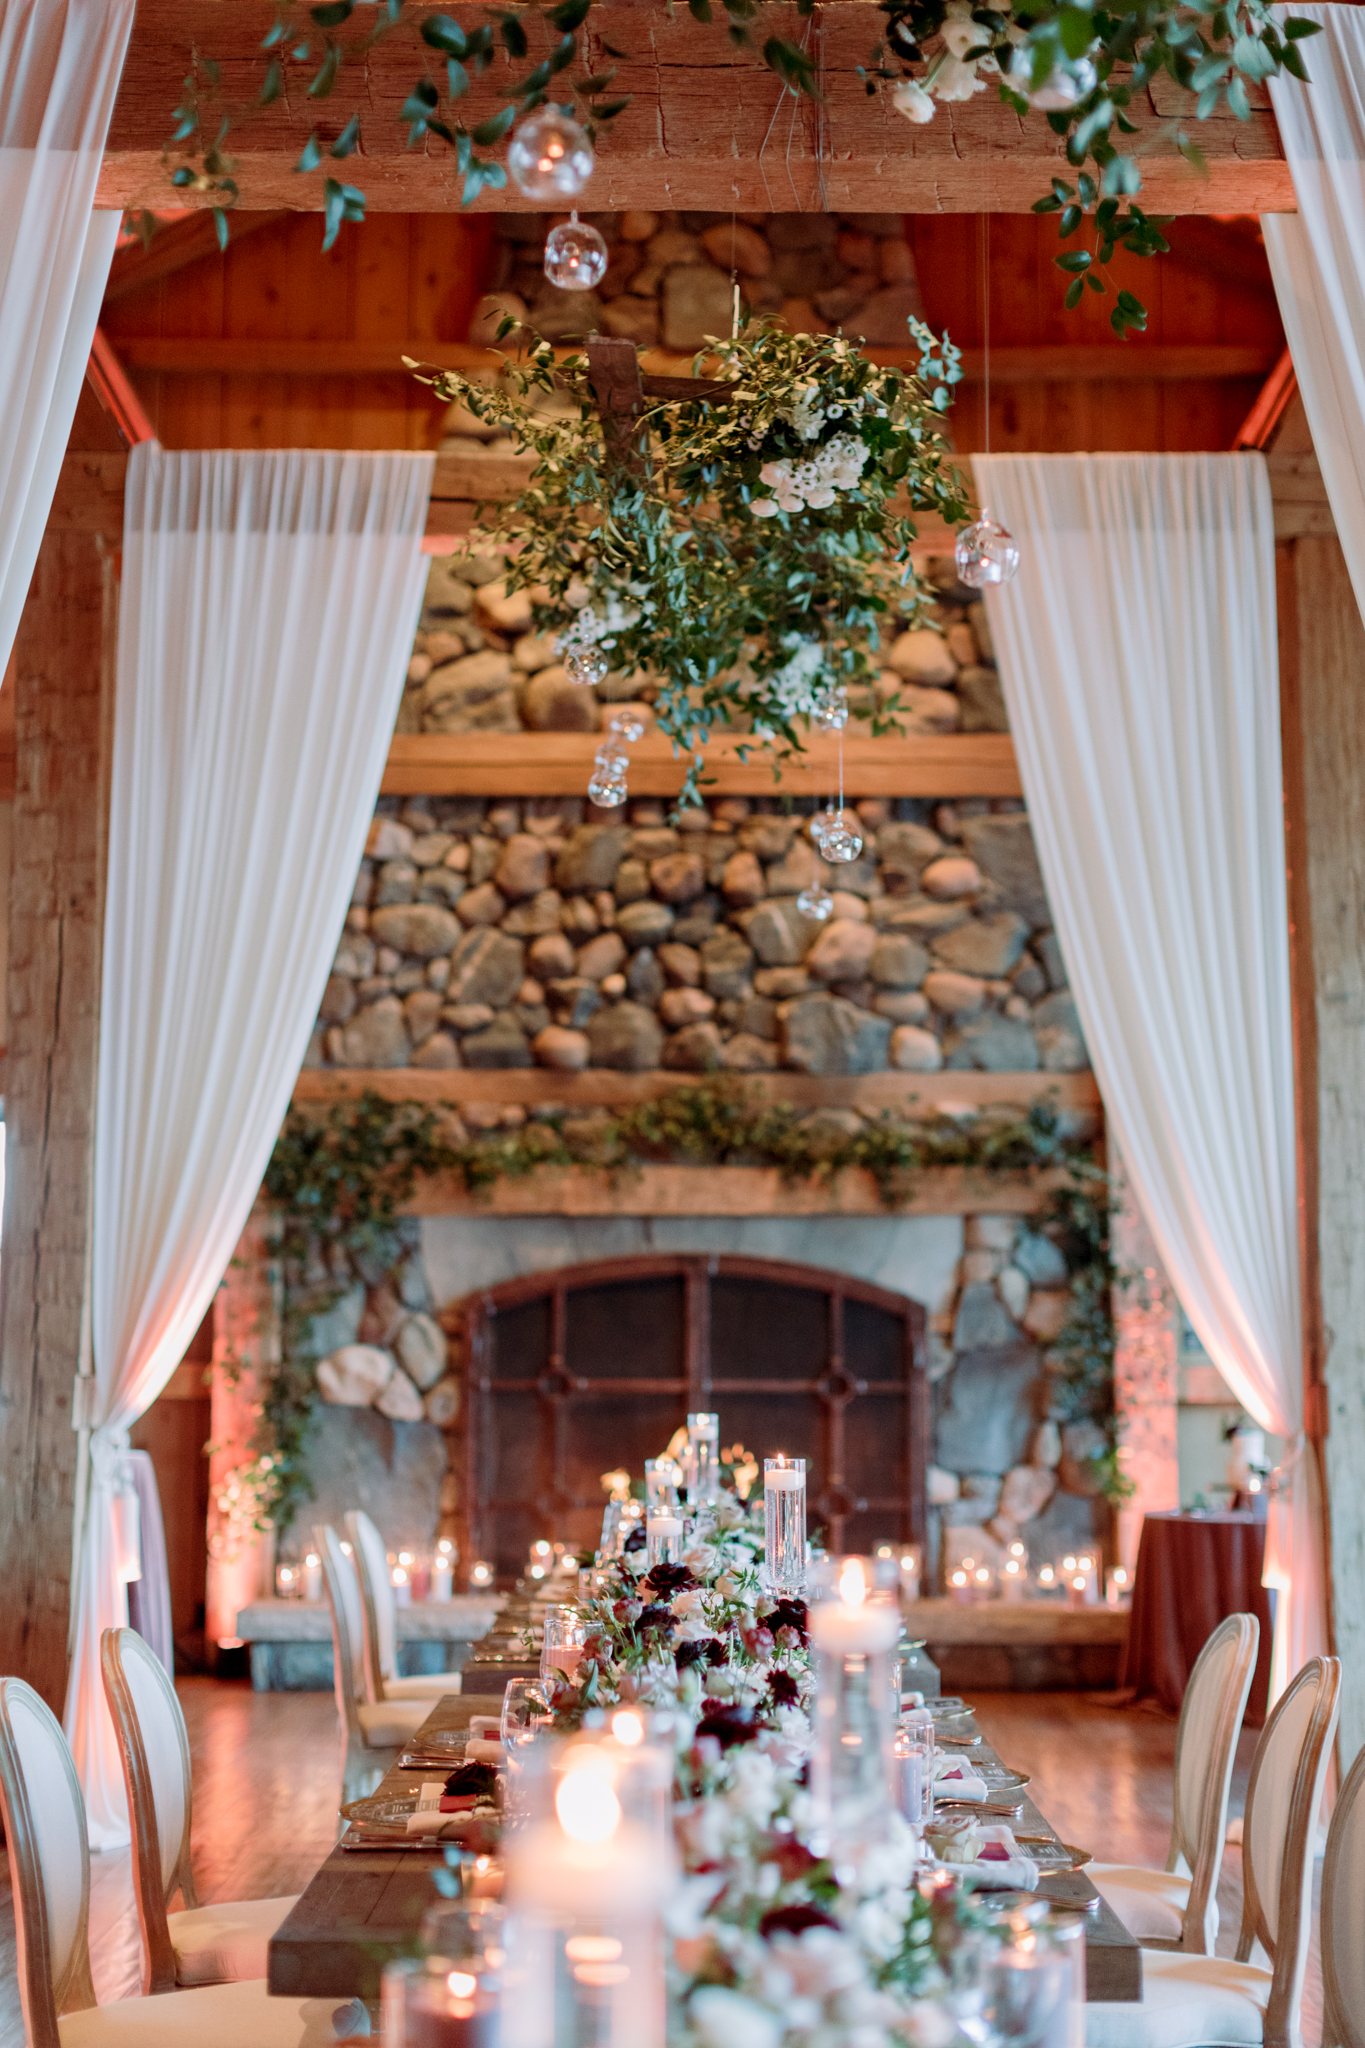 Devils-Thumb-Ranch-Tabernash-Colorado-Winter-Broad-Axe-Barn-Reception-Table-Runners-Farm-Tables